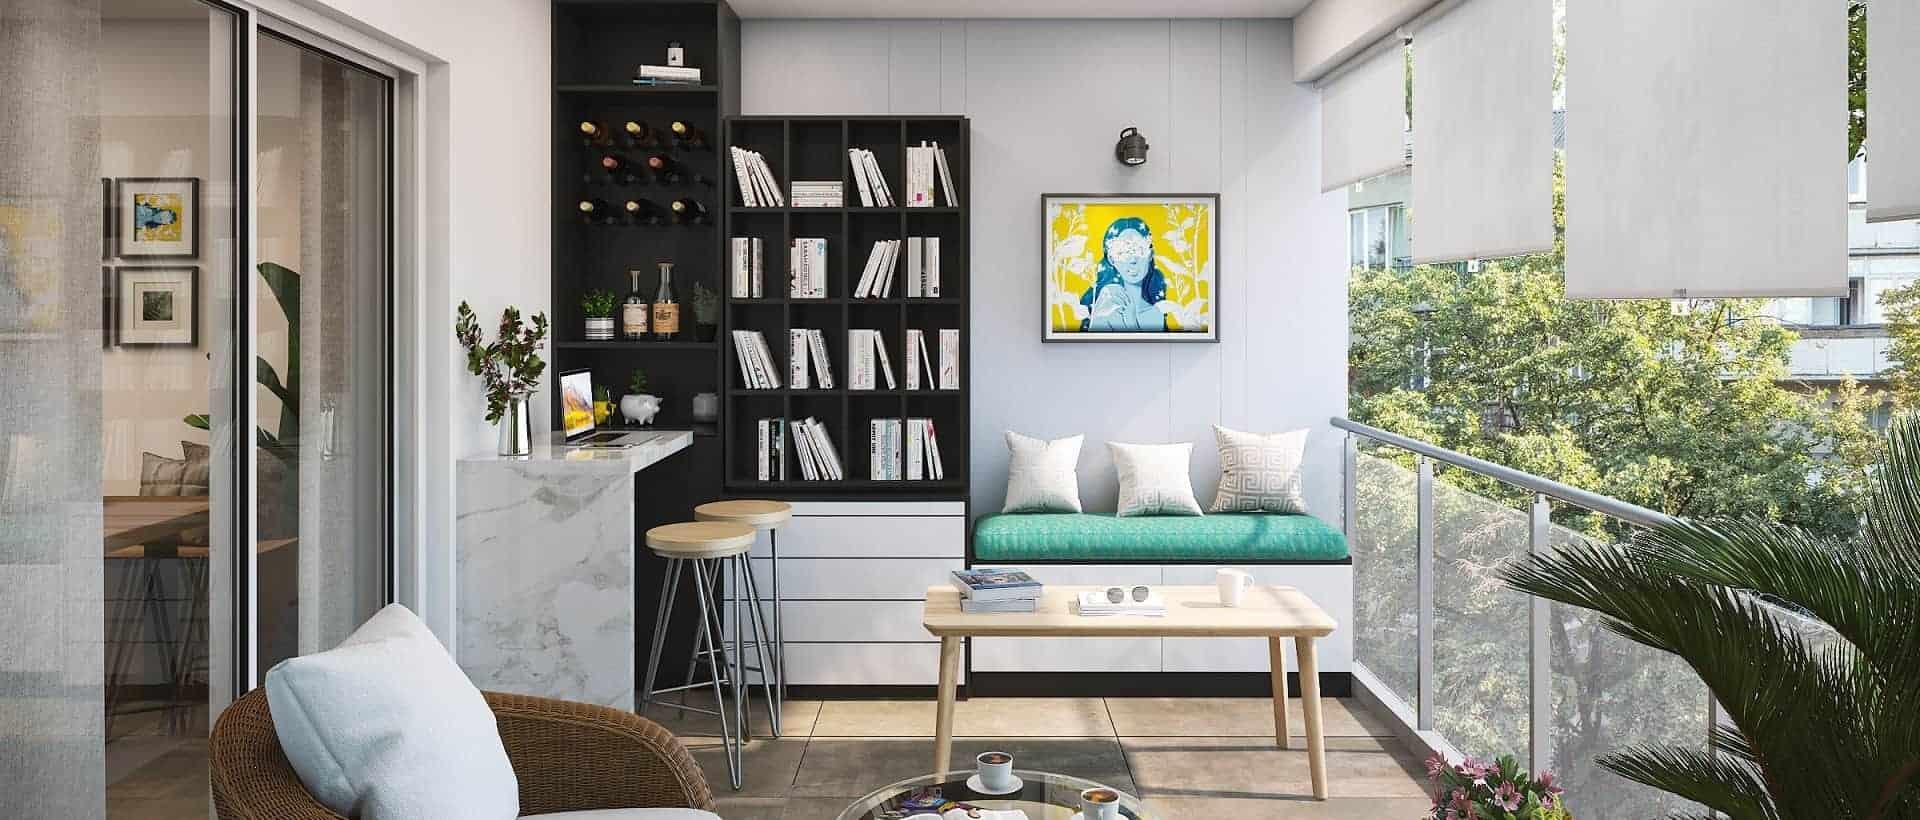 Space Saving Innovative Home Interiors